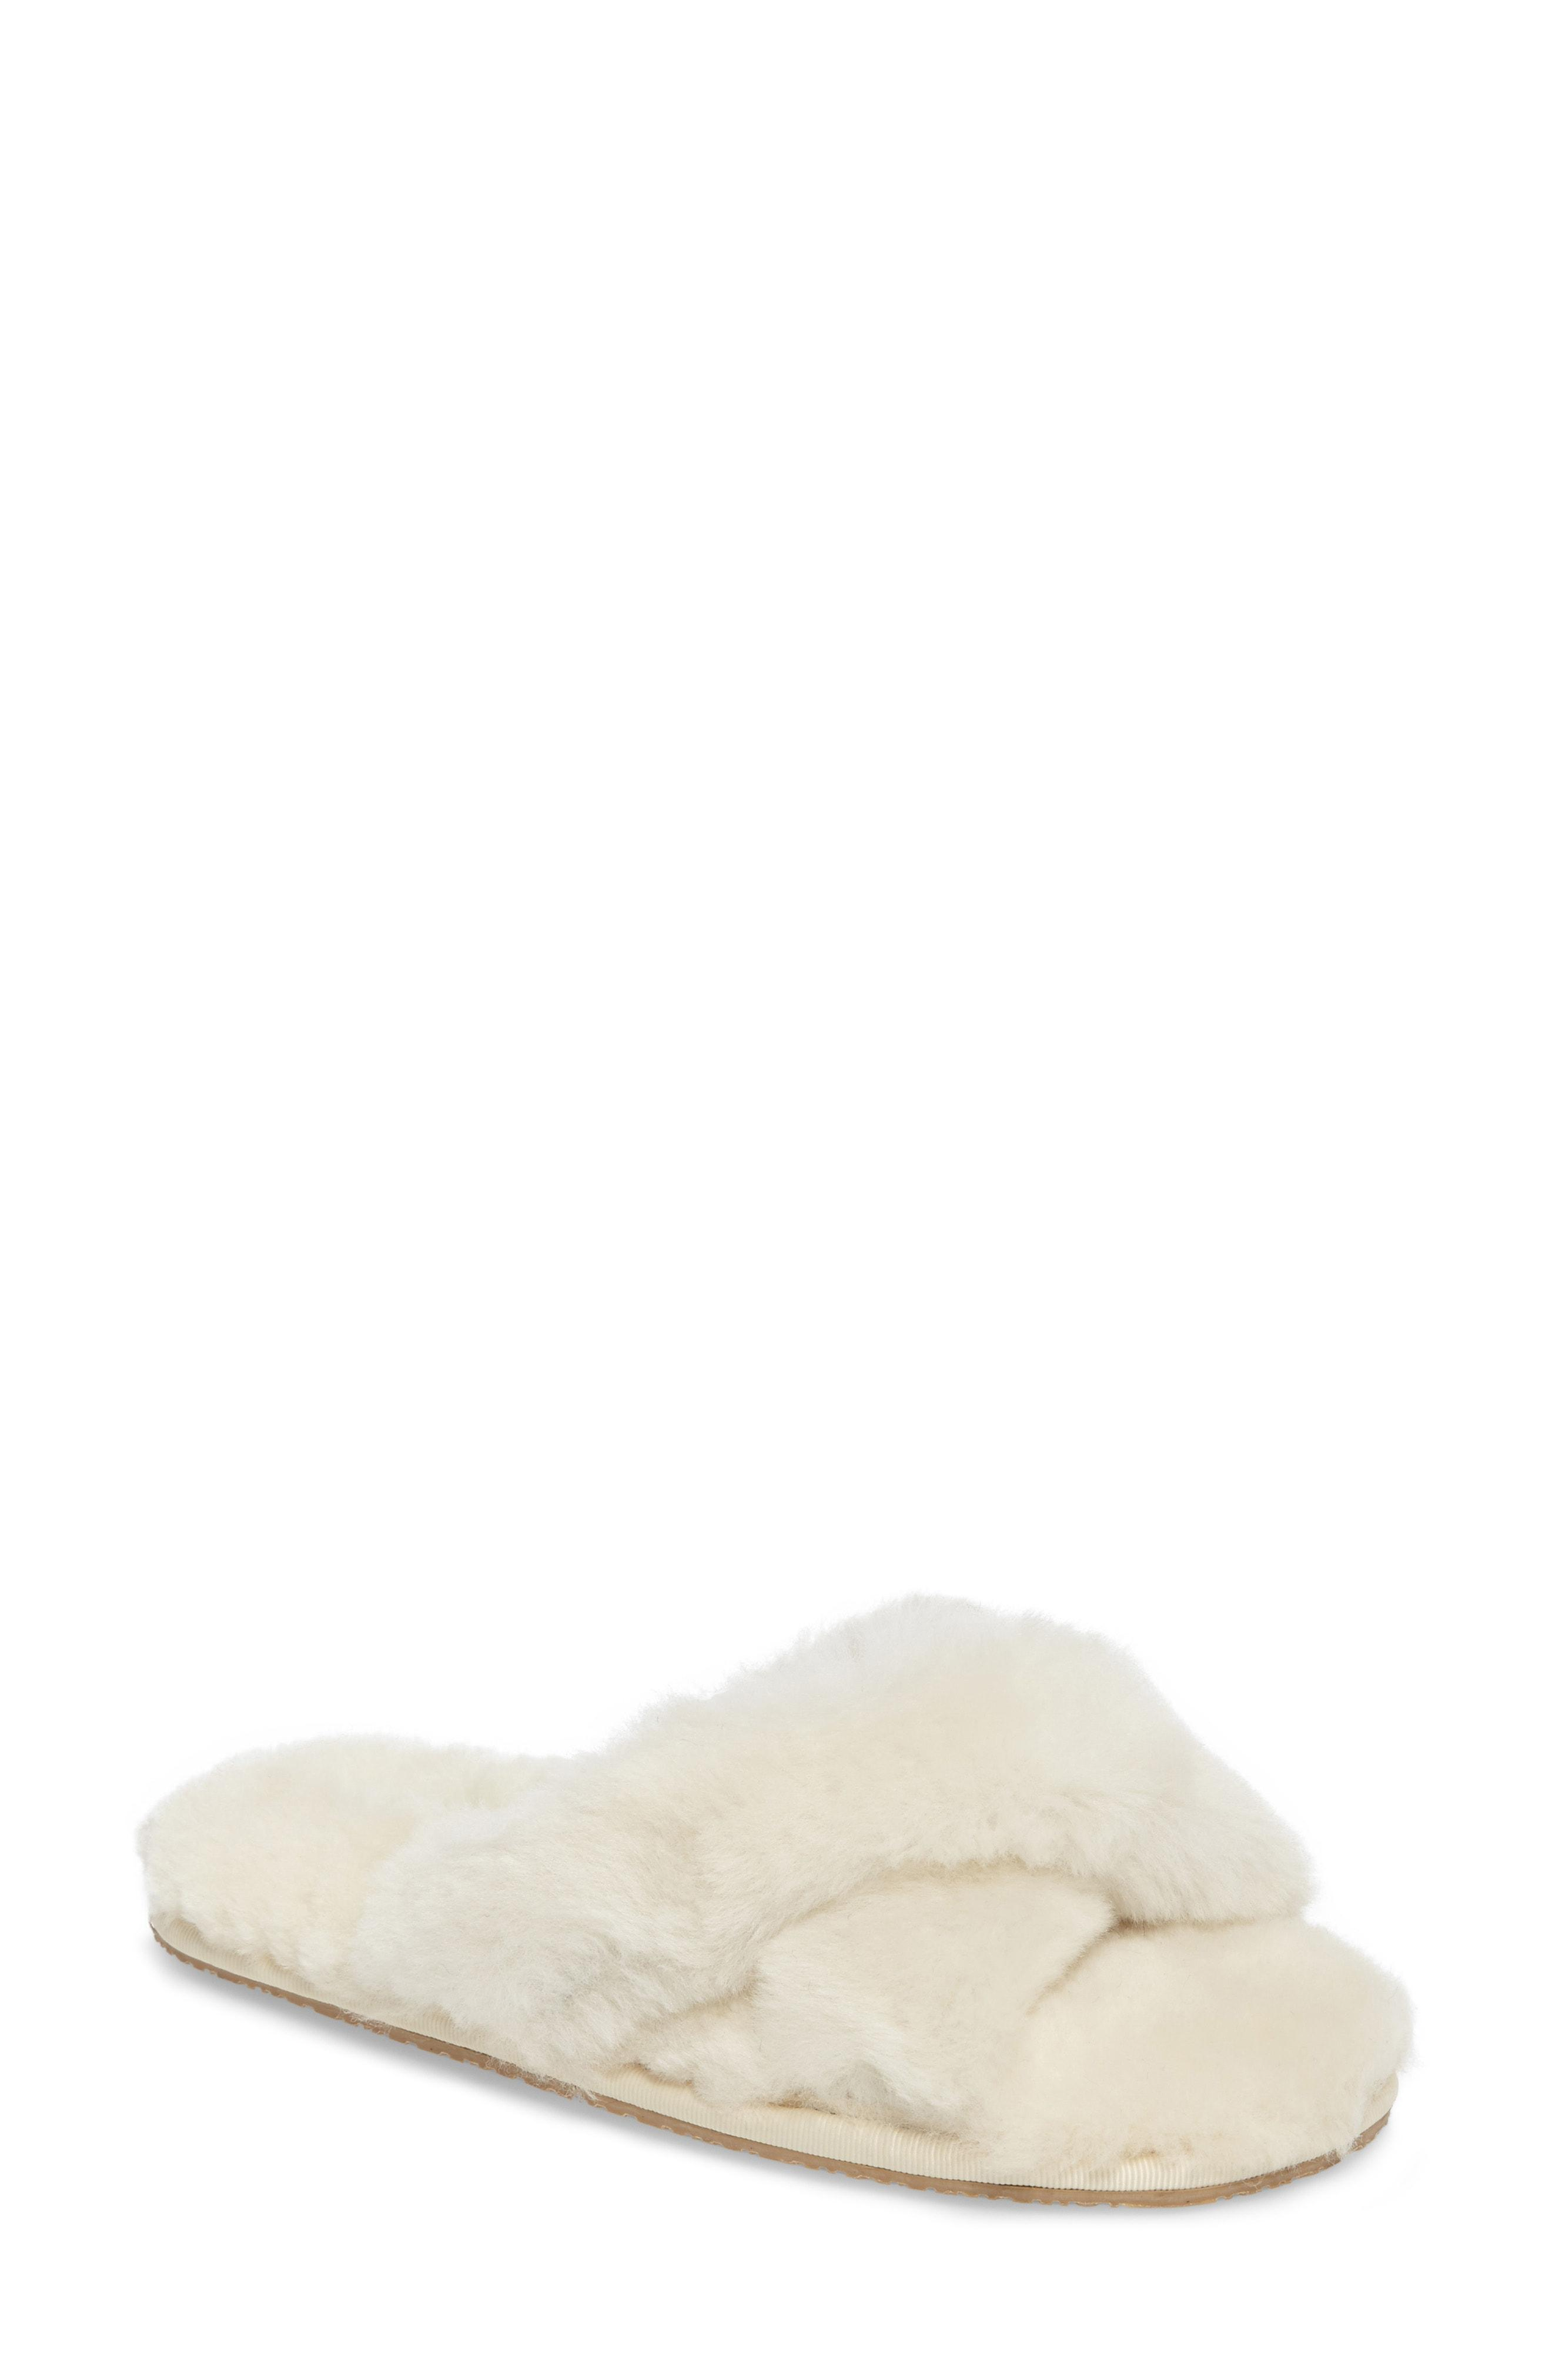 b3ae1a21bbd Patricia Green Mt. Hood Genuine Shearling Slipper In Ivory